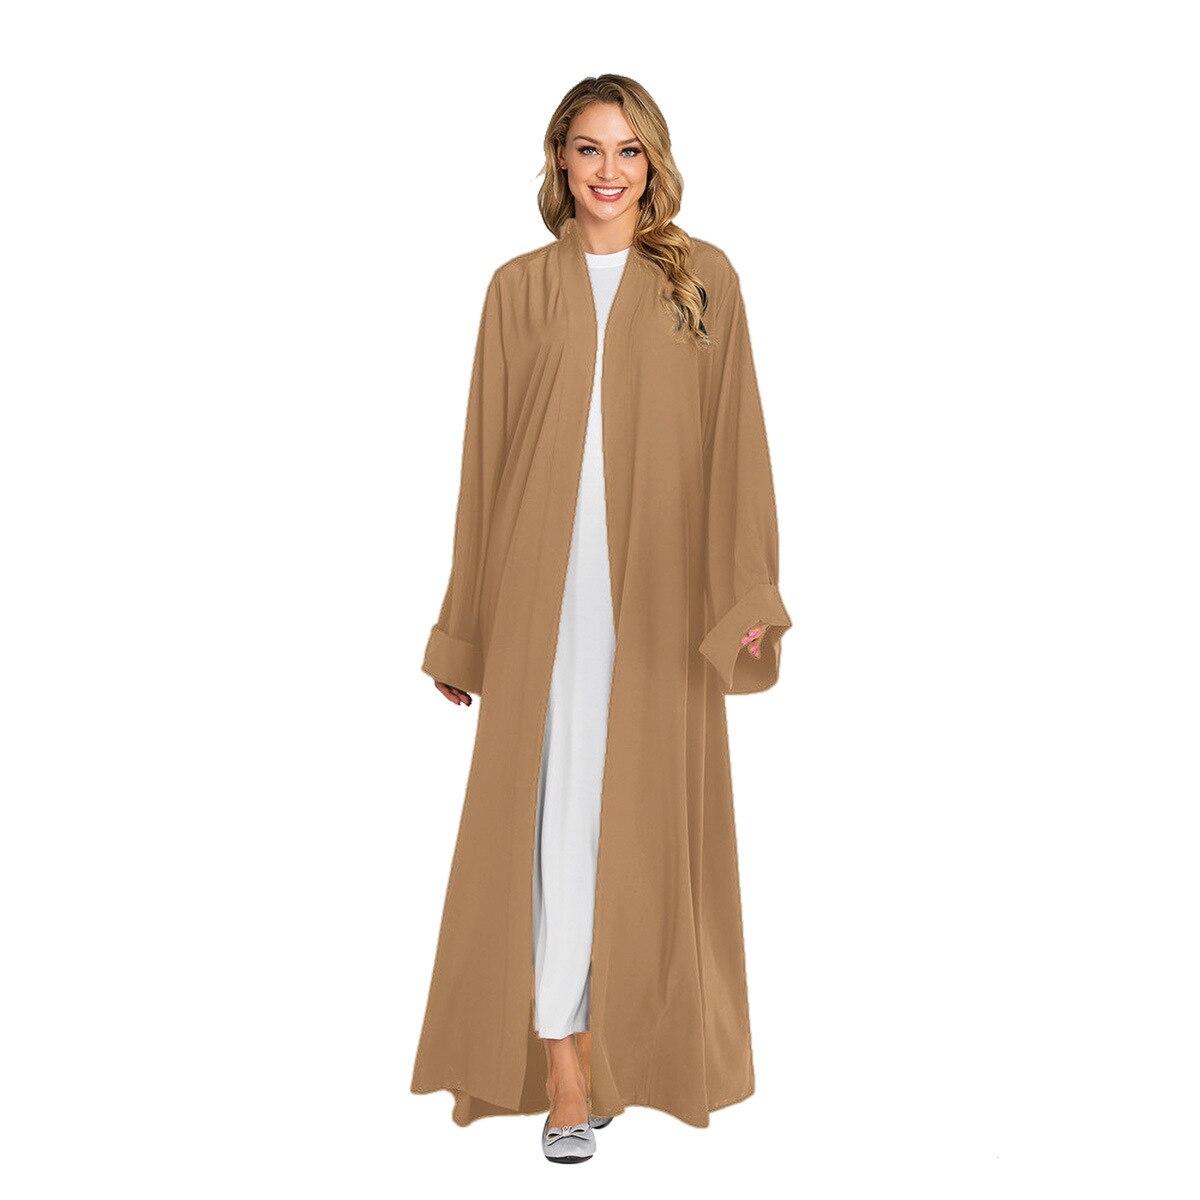 Solid Kimono Open Abaya Dubai Kaftan Muslim Hijab Dress Abayas Robe Africaine Femme Caftan Turkish Islam Clothing Oman For Women Women Women's Abaya Women's Clothings